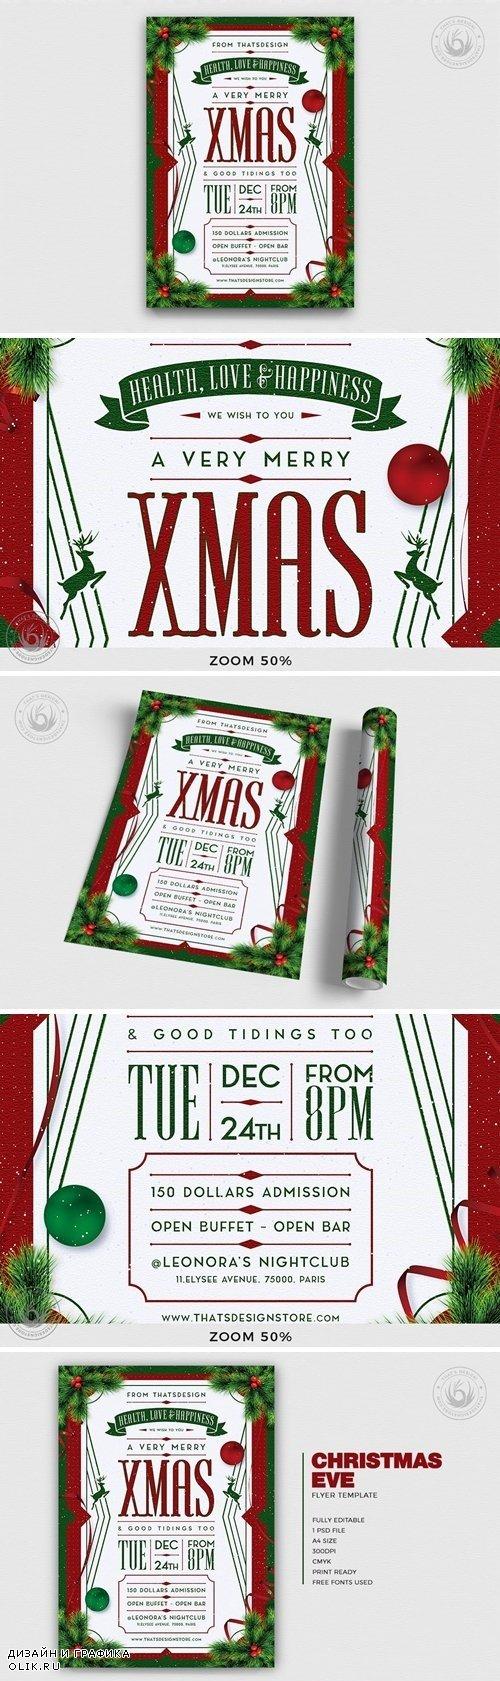 Christmas Eve Flyer Template V8 - 24803639 - 4187133